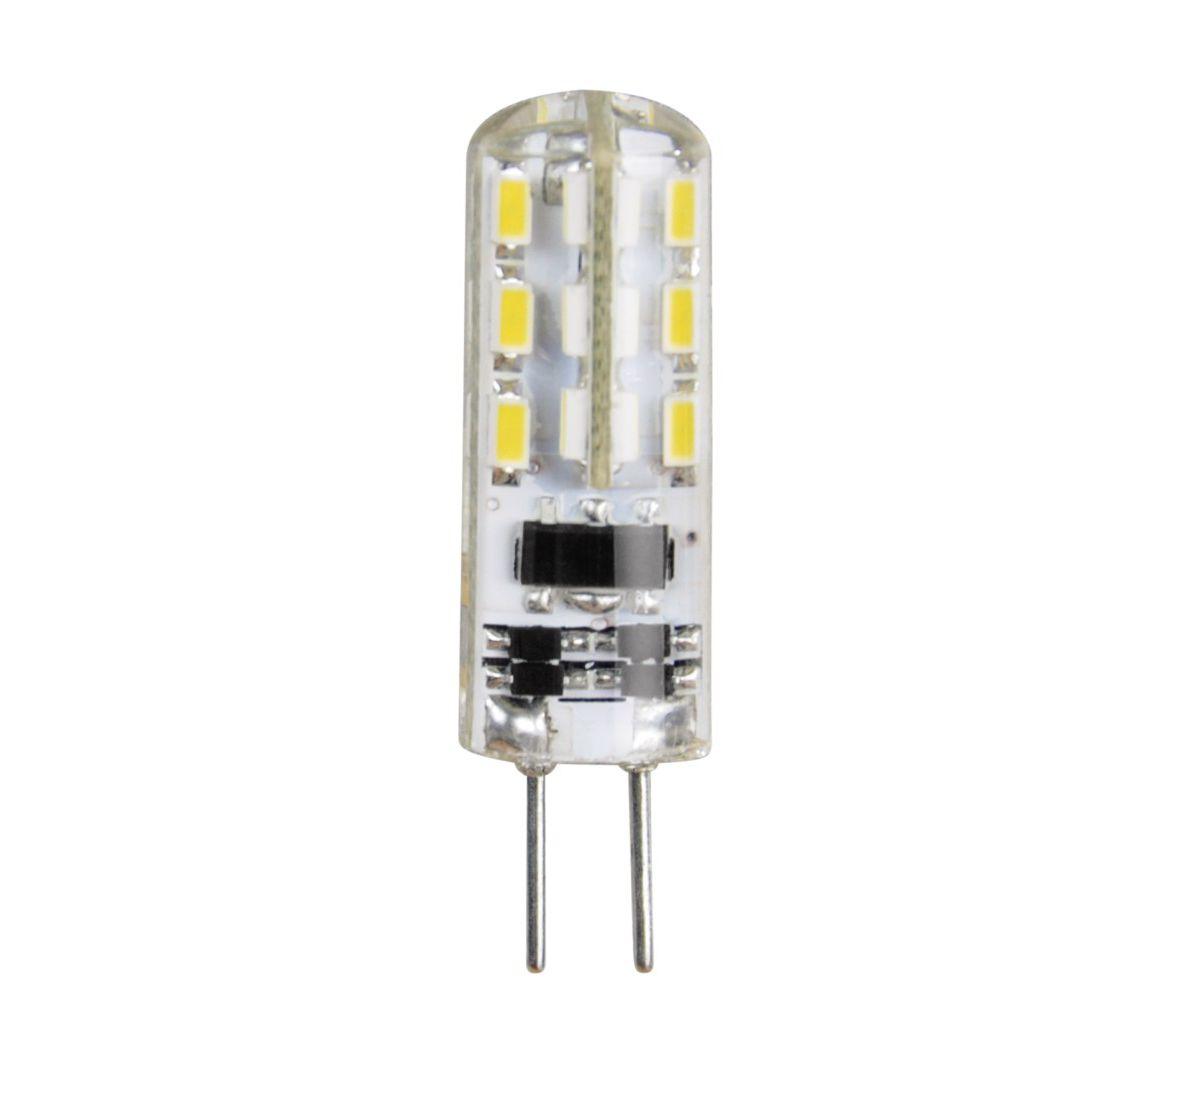 Xavax LED-Lampe, G4, 100lm ersetzt 11W Stiftsoc...